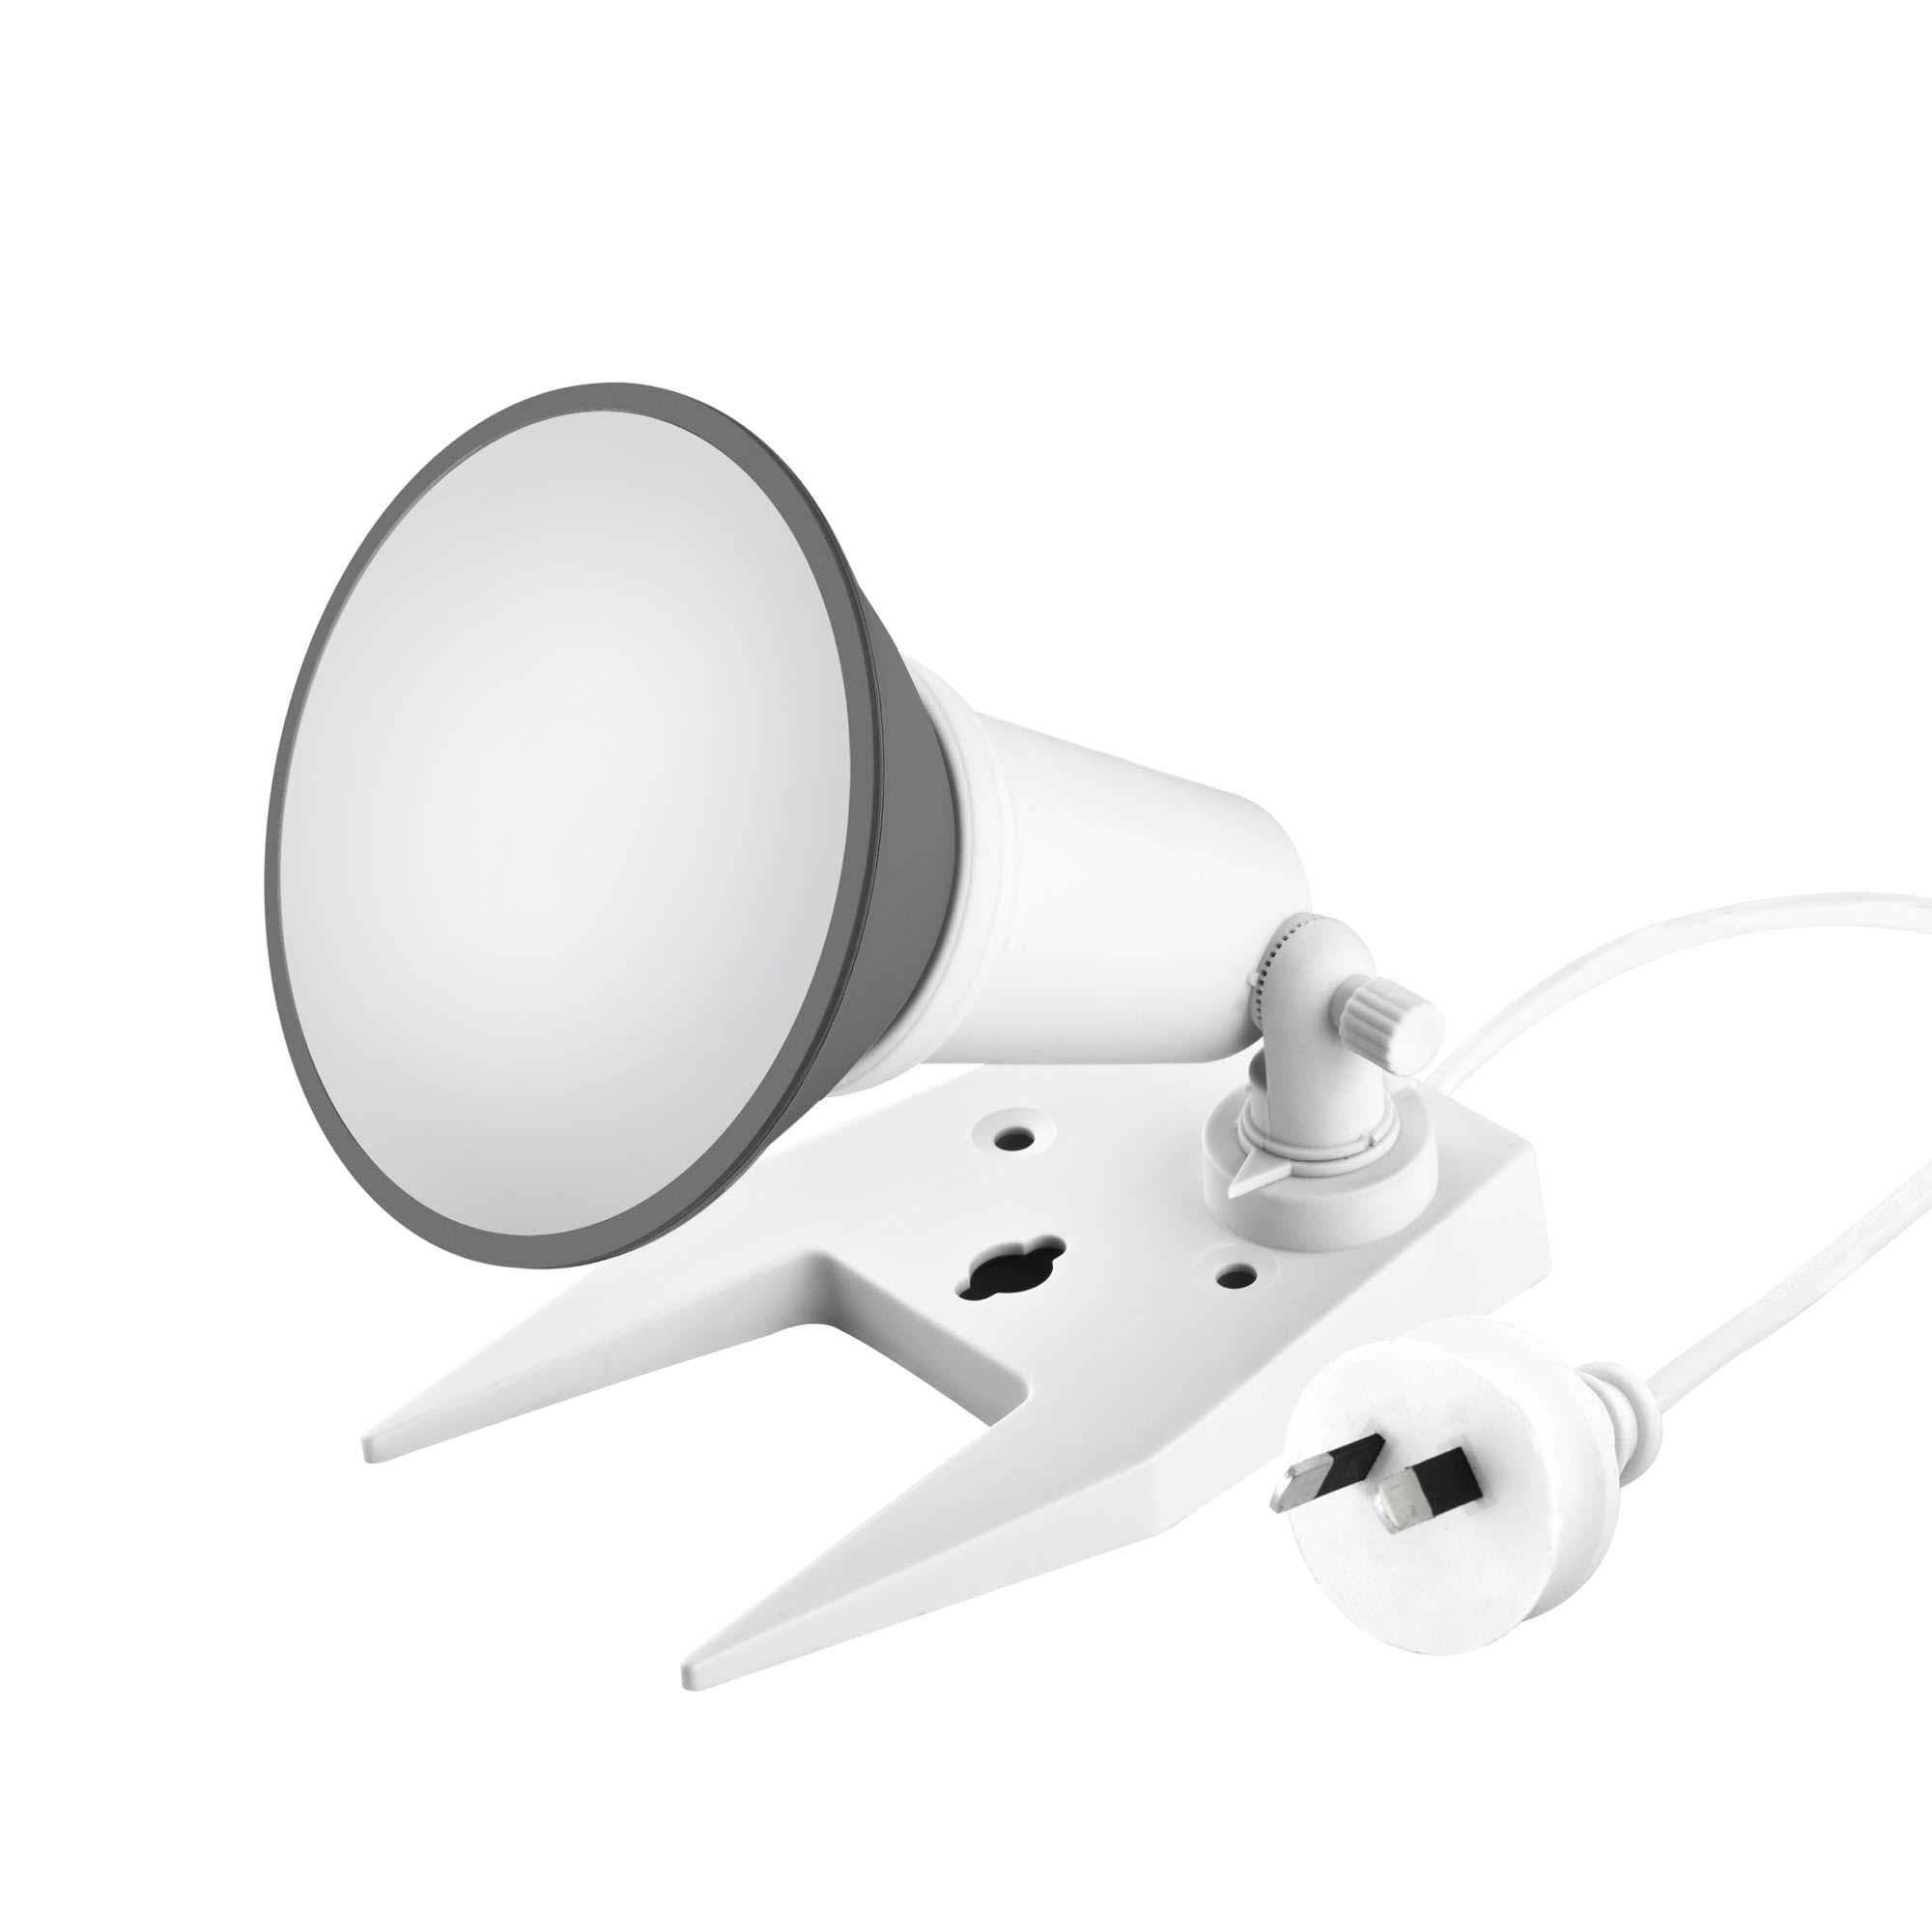 White portable floodlight with 10w led par38 globe